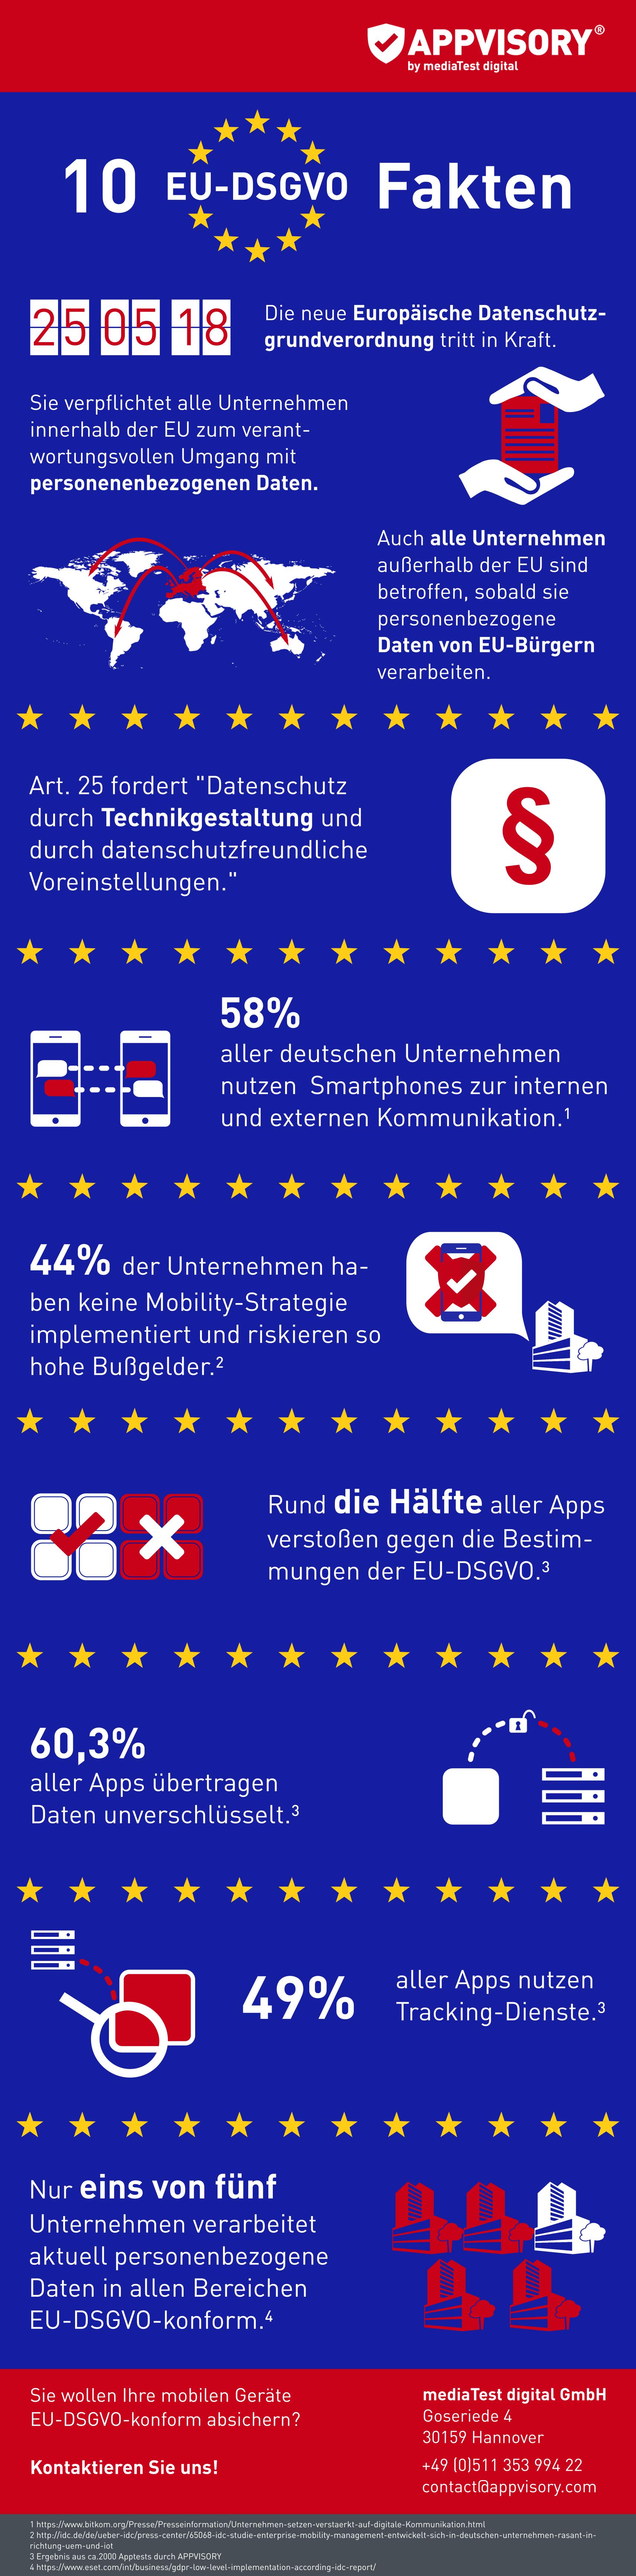 Mobility EU-DSGVO Datenschutzgrundverordnung Apps Handys Smartphones Statistik Daten Fakten